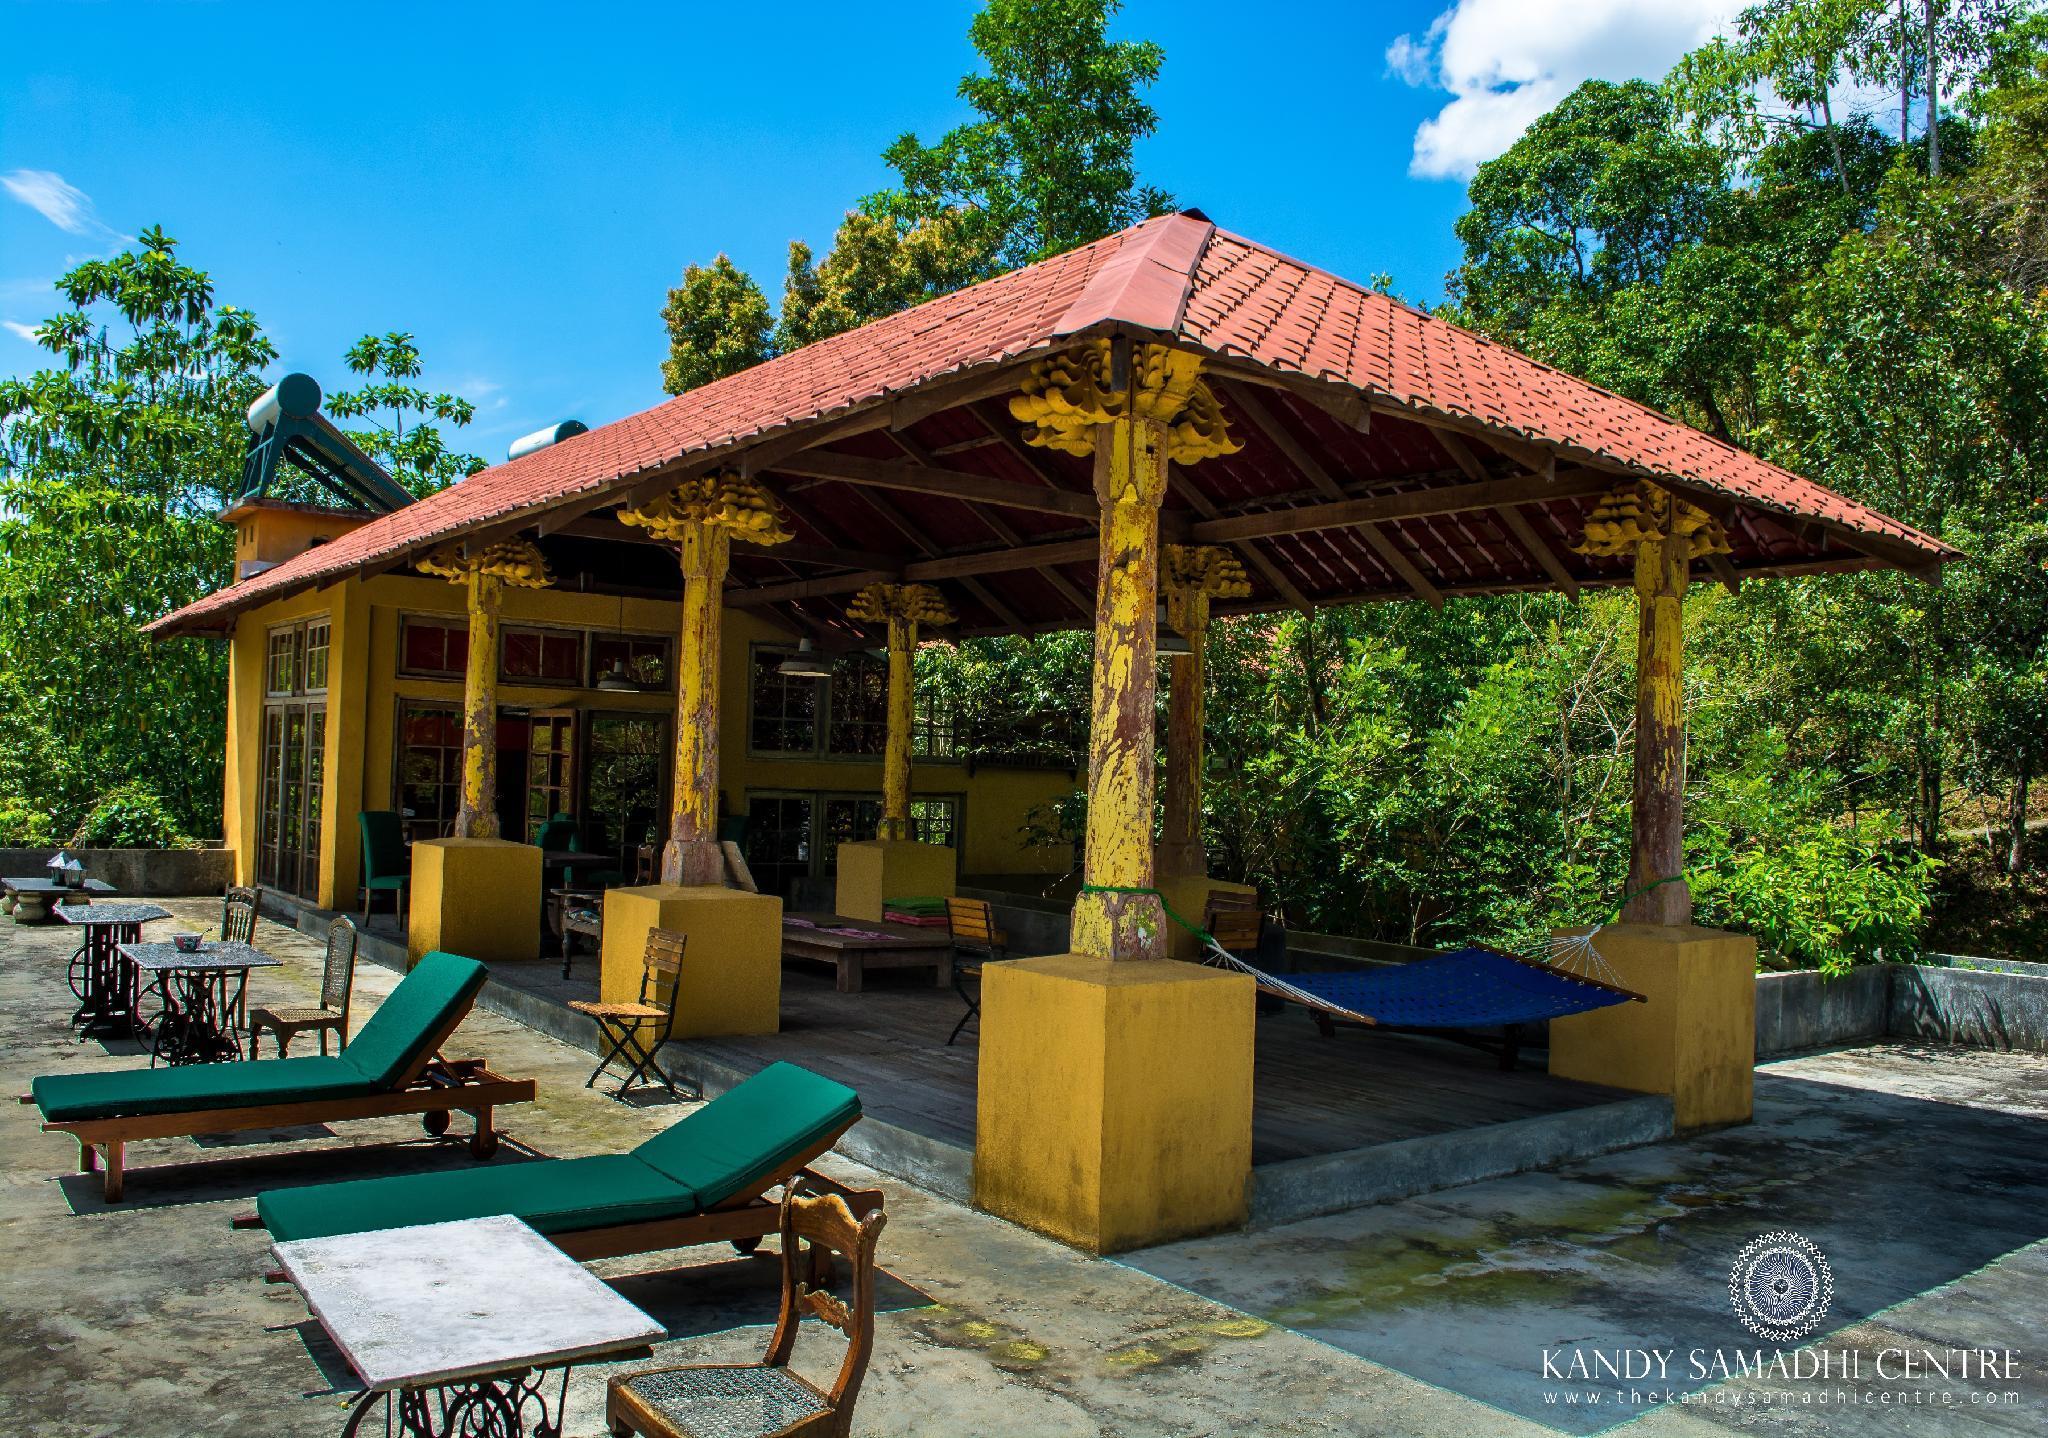 Kandy Samadhi Centre Hotel